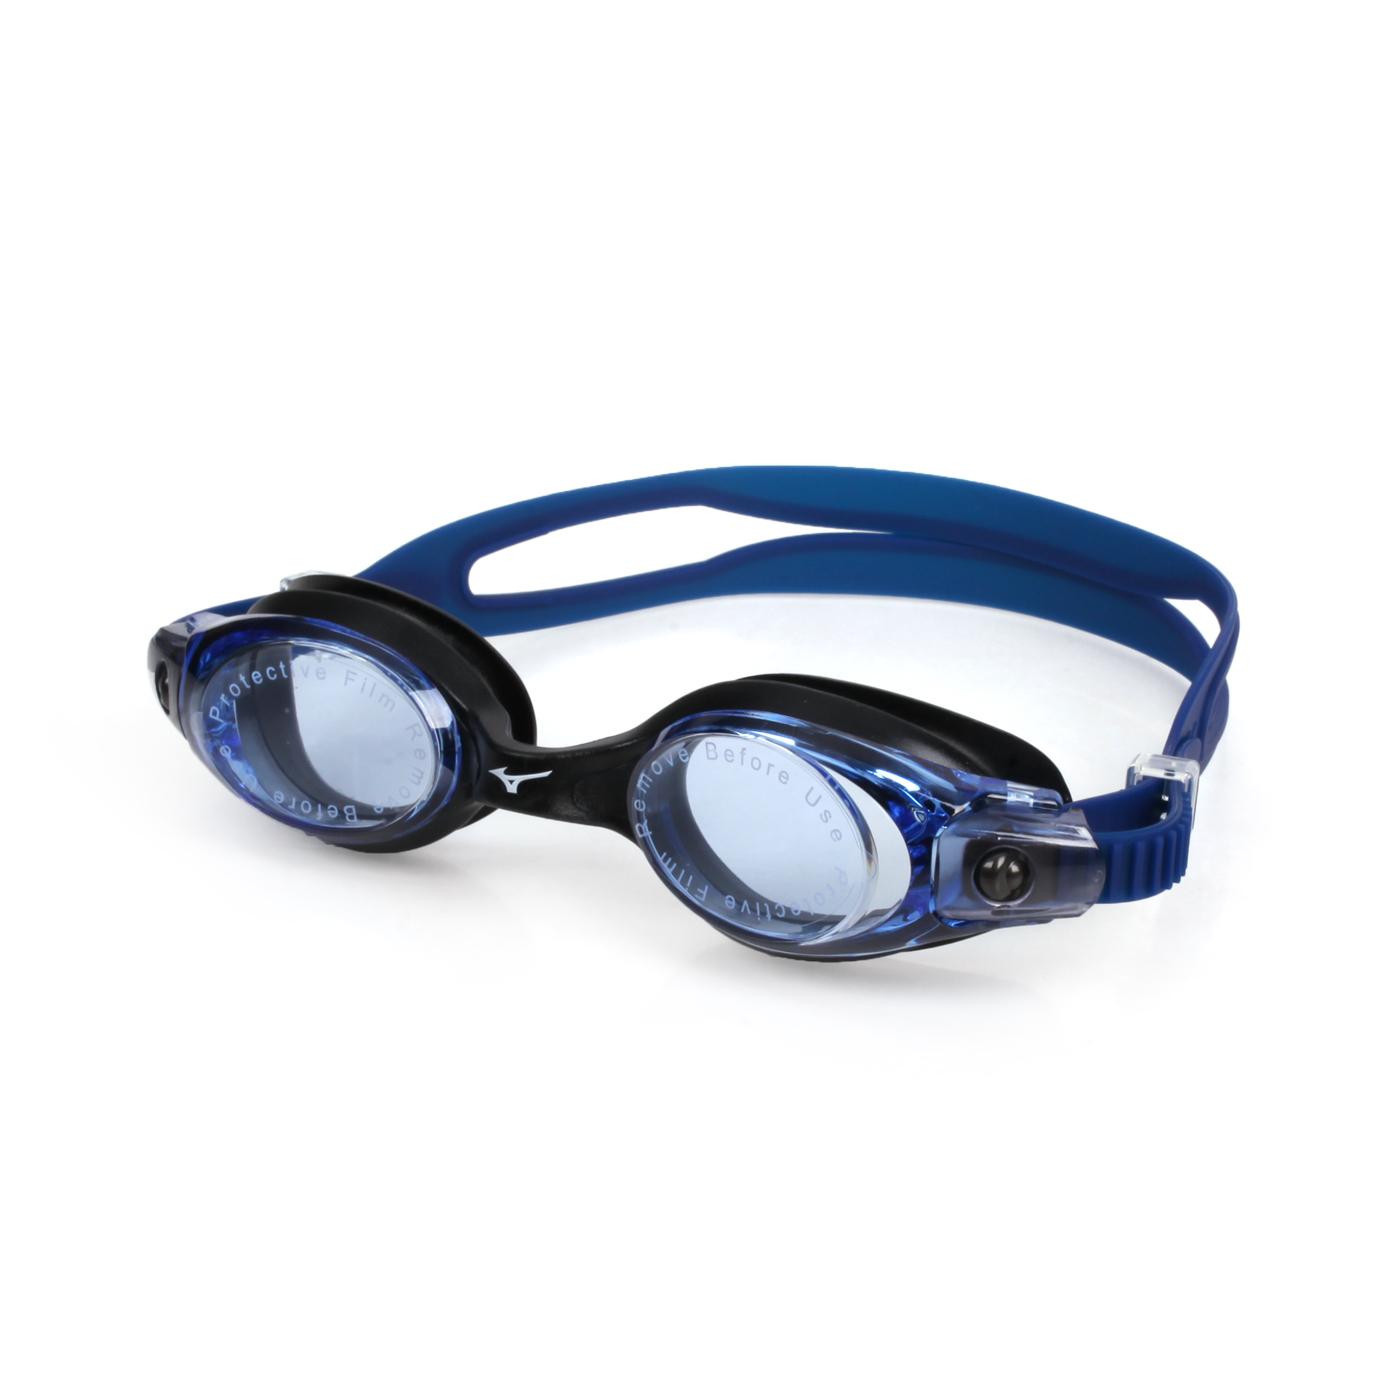 MIZUNO 泳鏡  SWIMN3TE701000-01 - 黑白藍